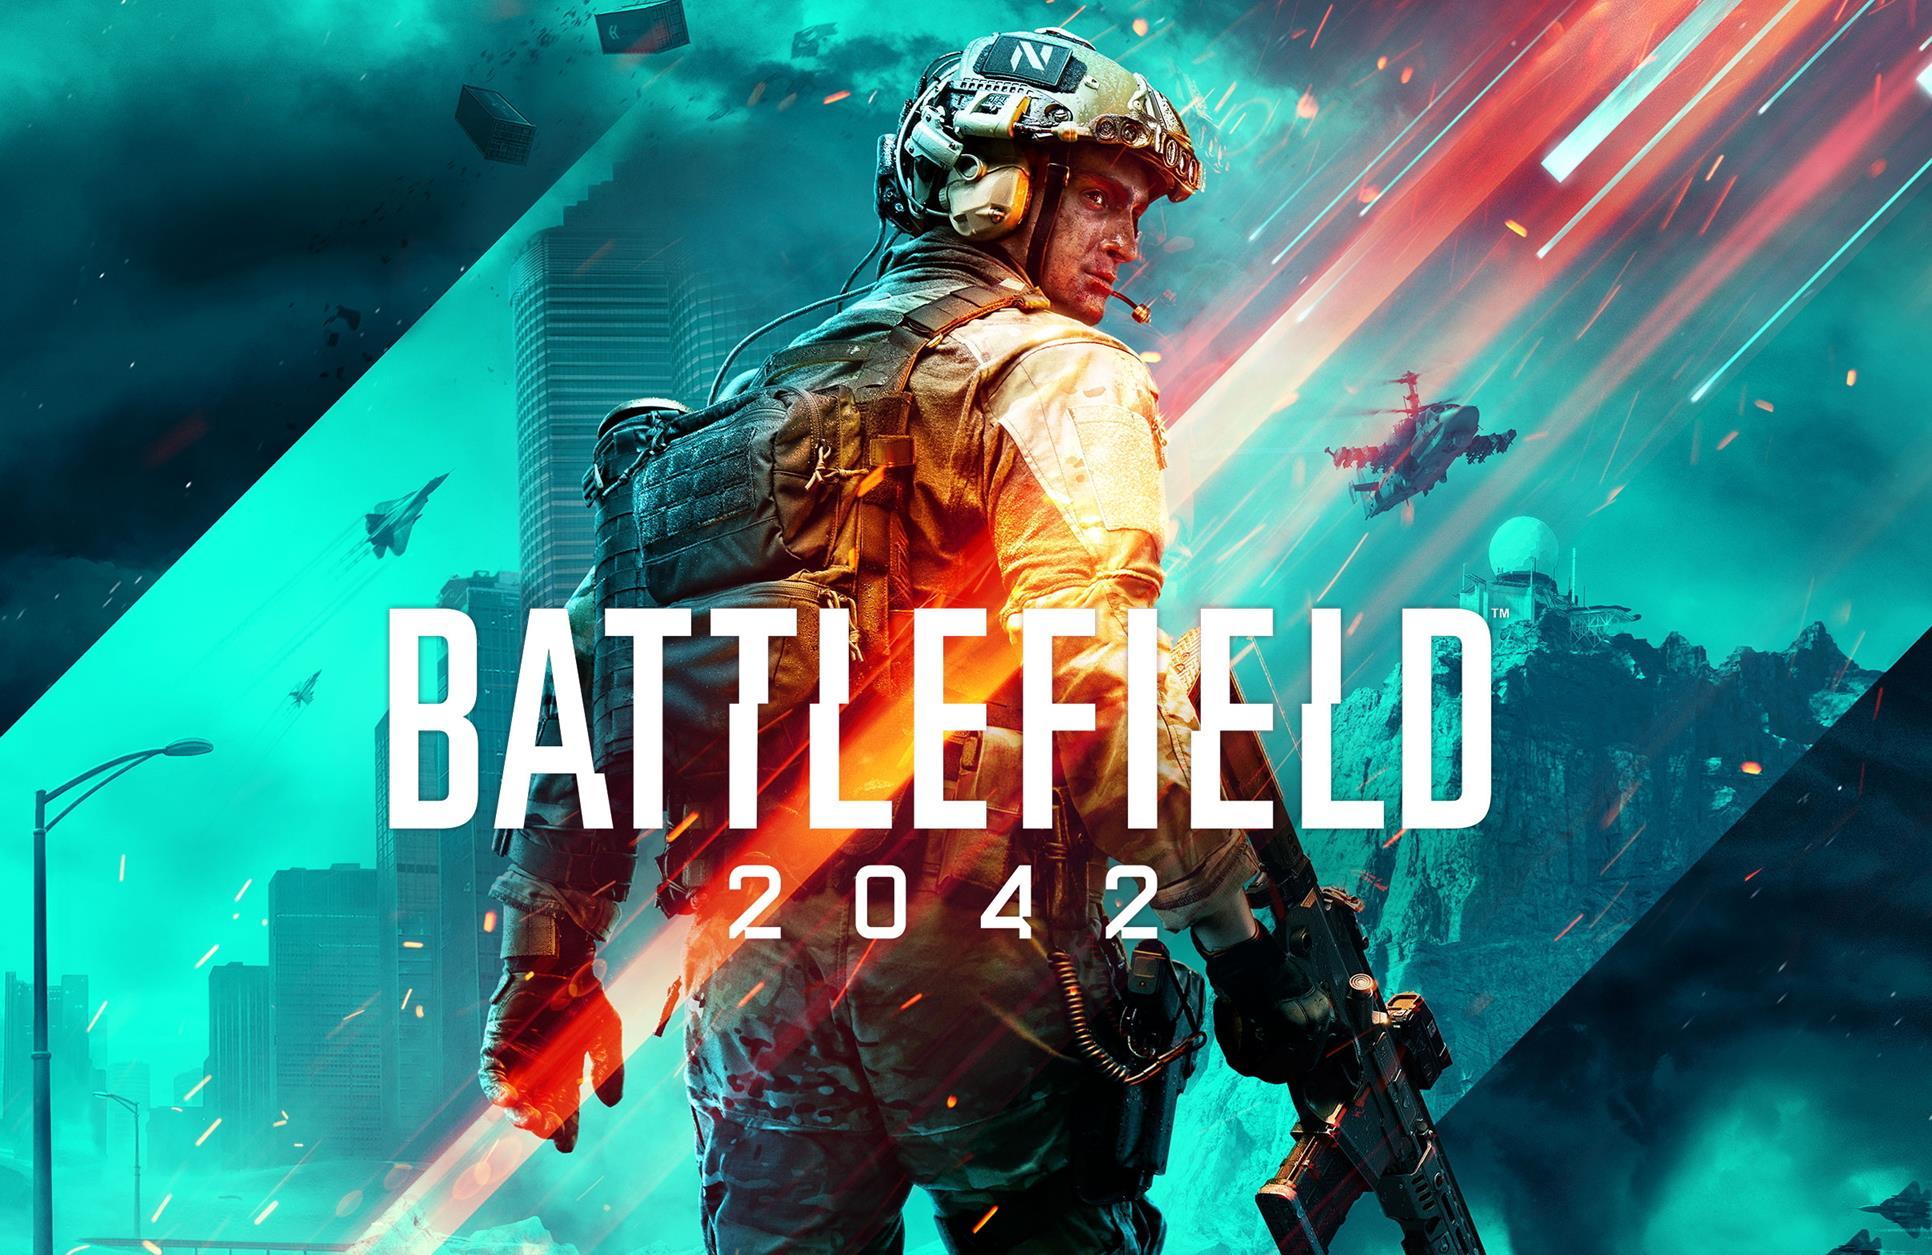 Battlefield 2042 open beta coming this September - VG247